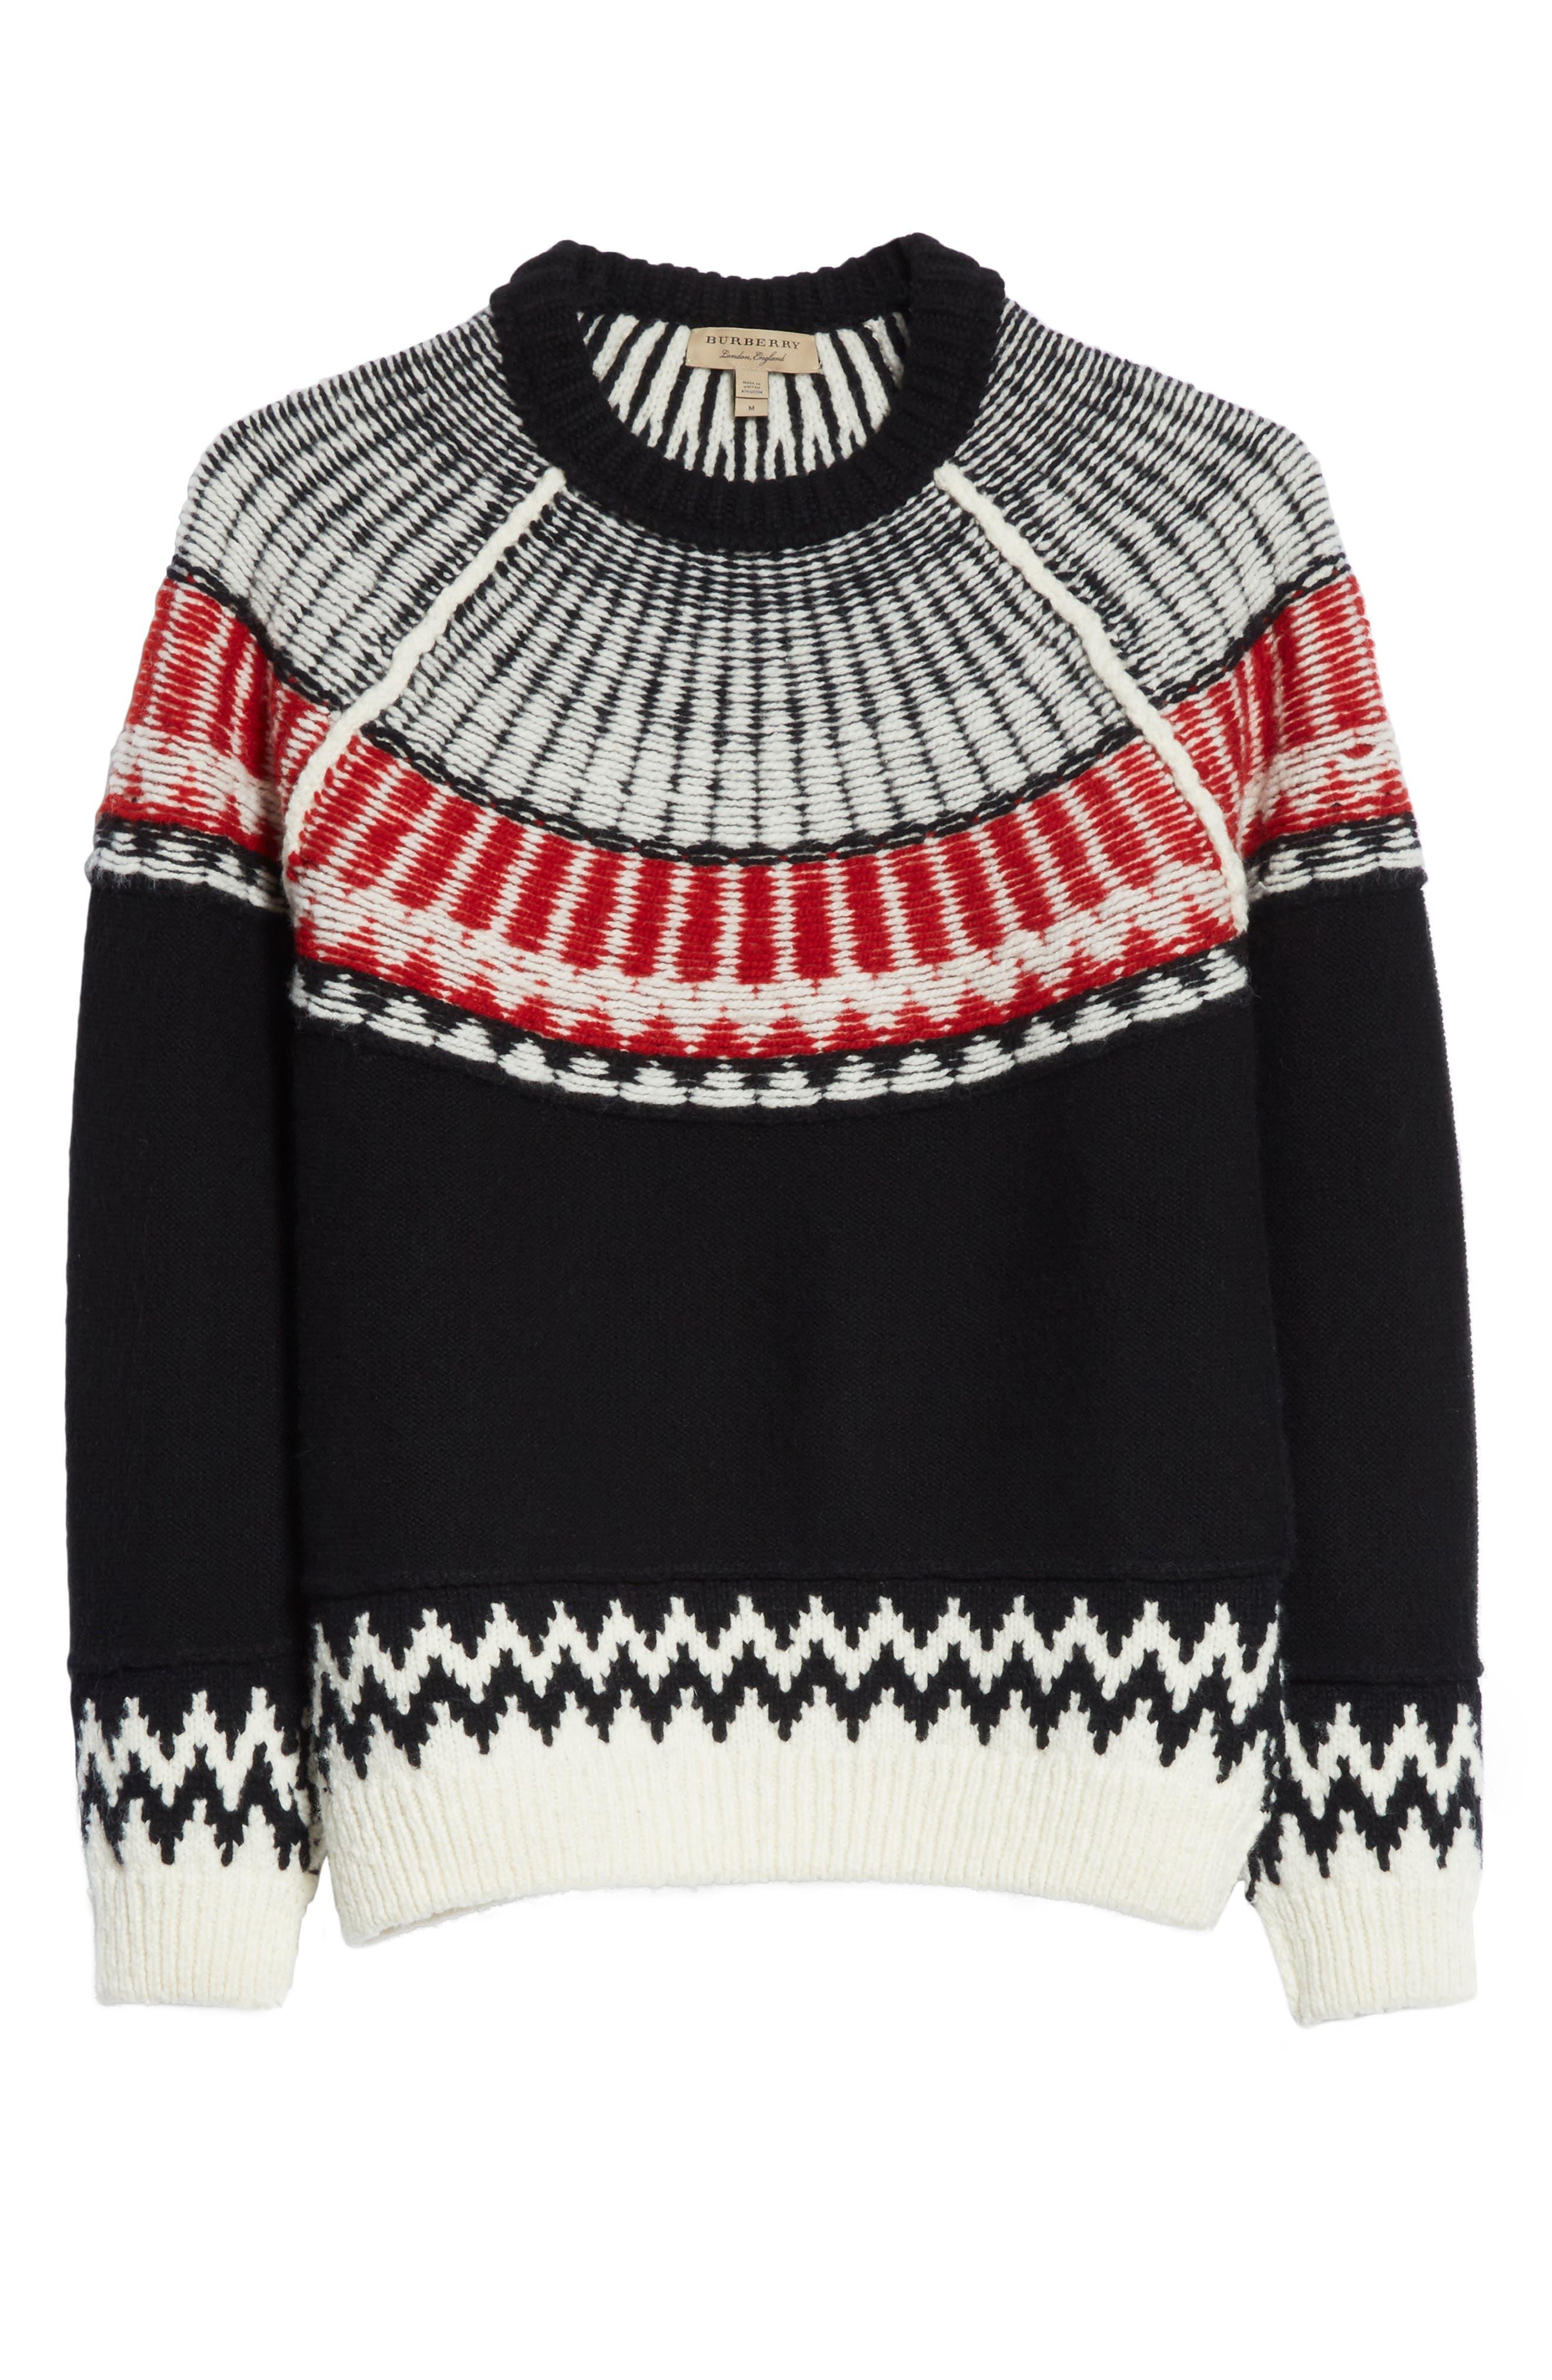 Rycroft Wool & Cashmere Blend Sweater,                             Alternate thumbnail 6, color,                             001